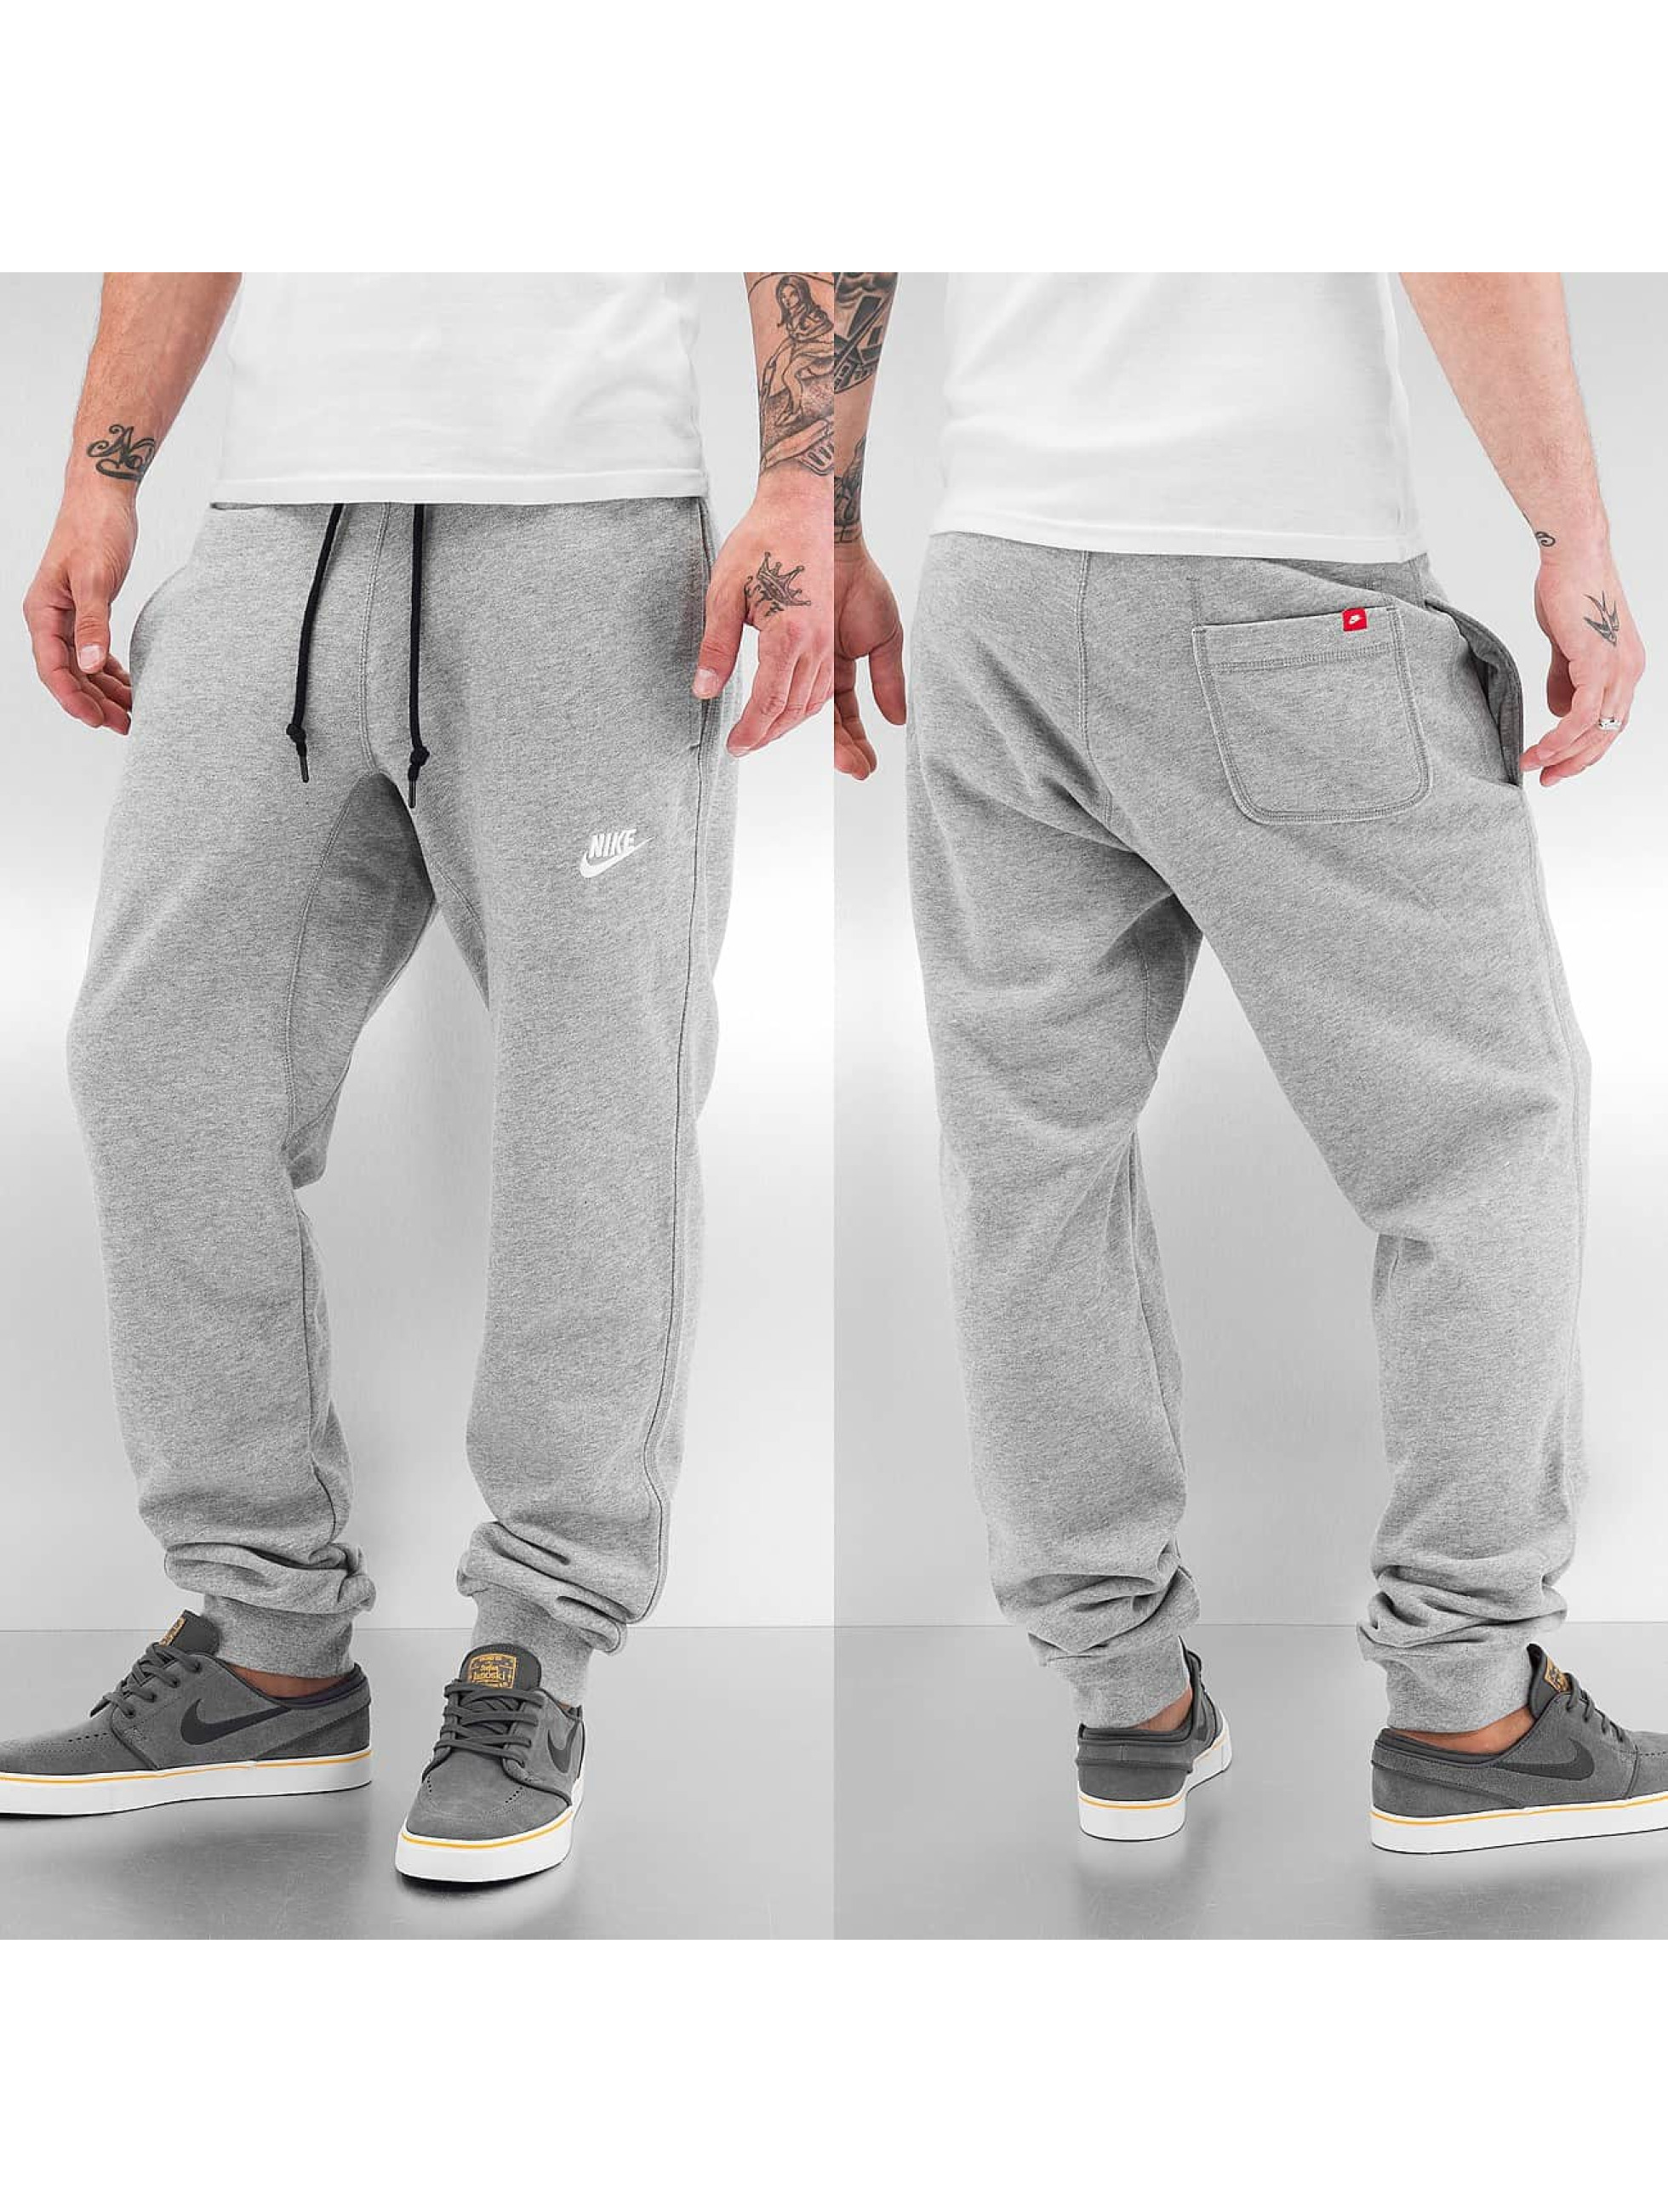 Nike Sportswear AW77 Jogginghose dark grey heather